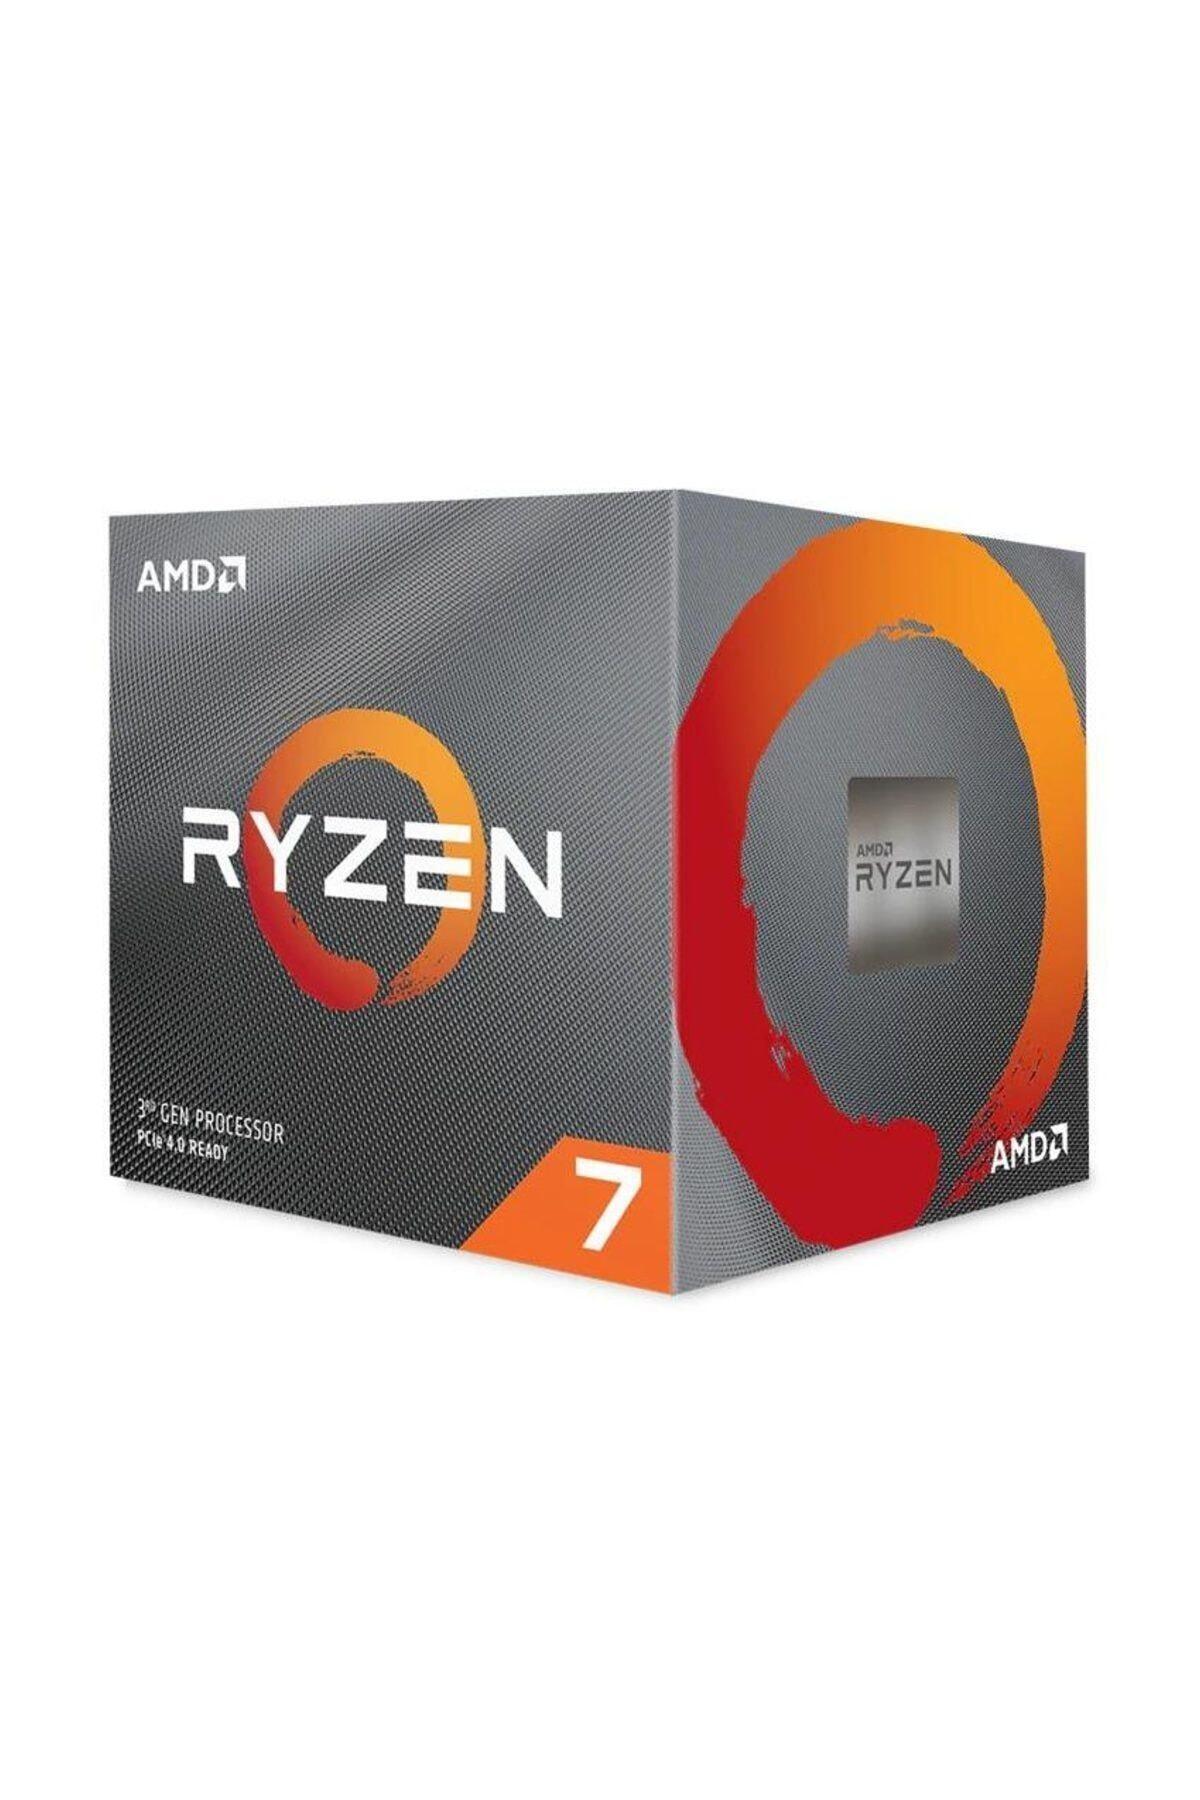 Amd Ryzen 7 3800x 3.9 - 4.5 Ghz Am4 Işlemci 1